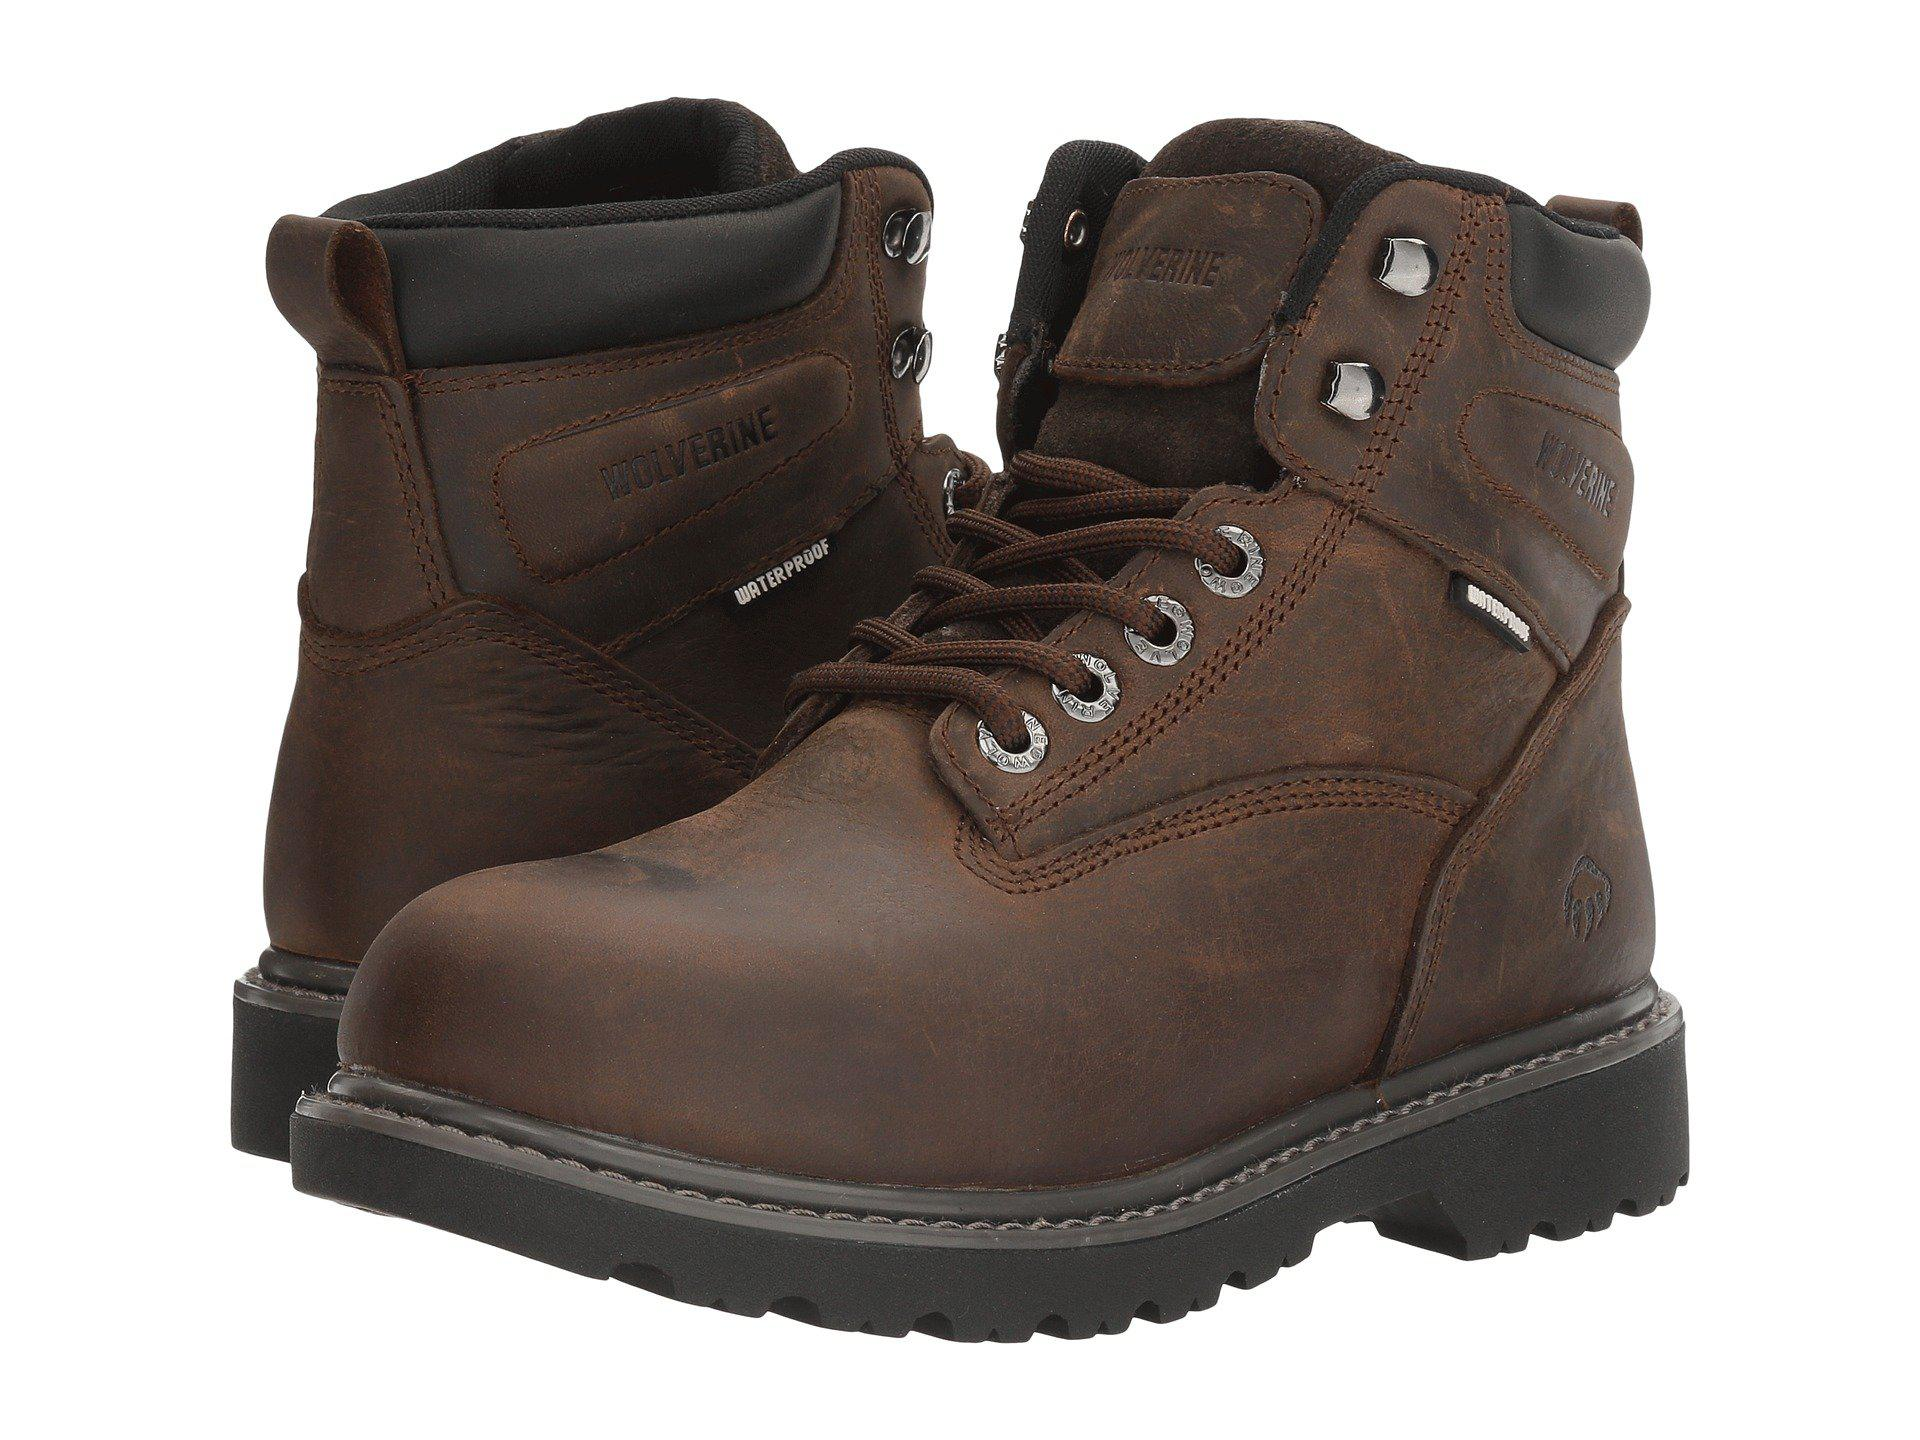 583365f0b7f Lyst - Wolverine Floorhand Waterproof (wheat) Women's Boots in Brown